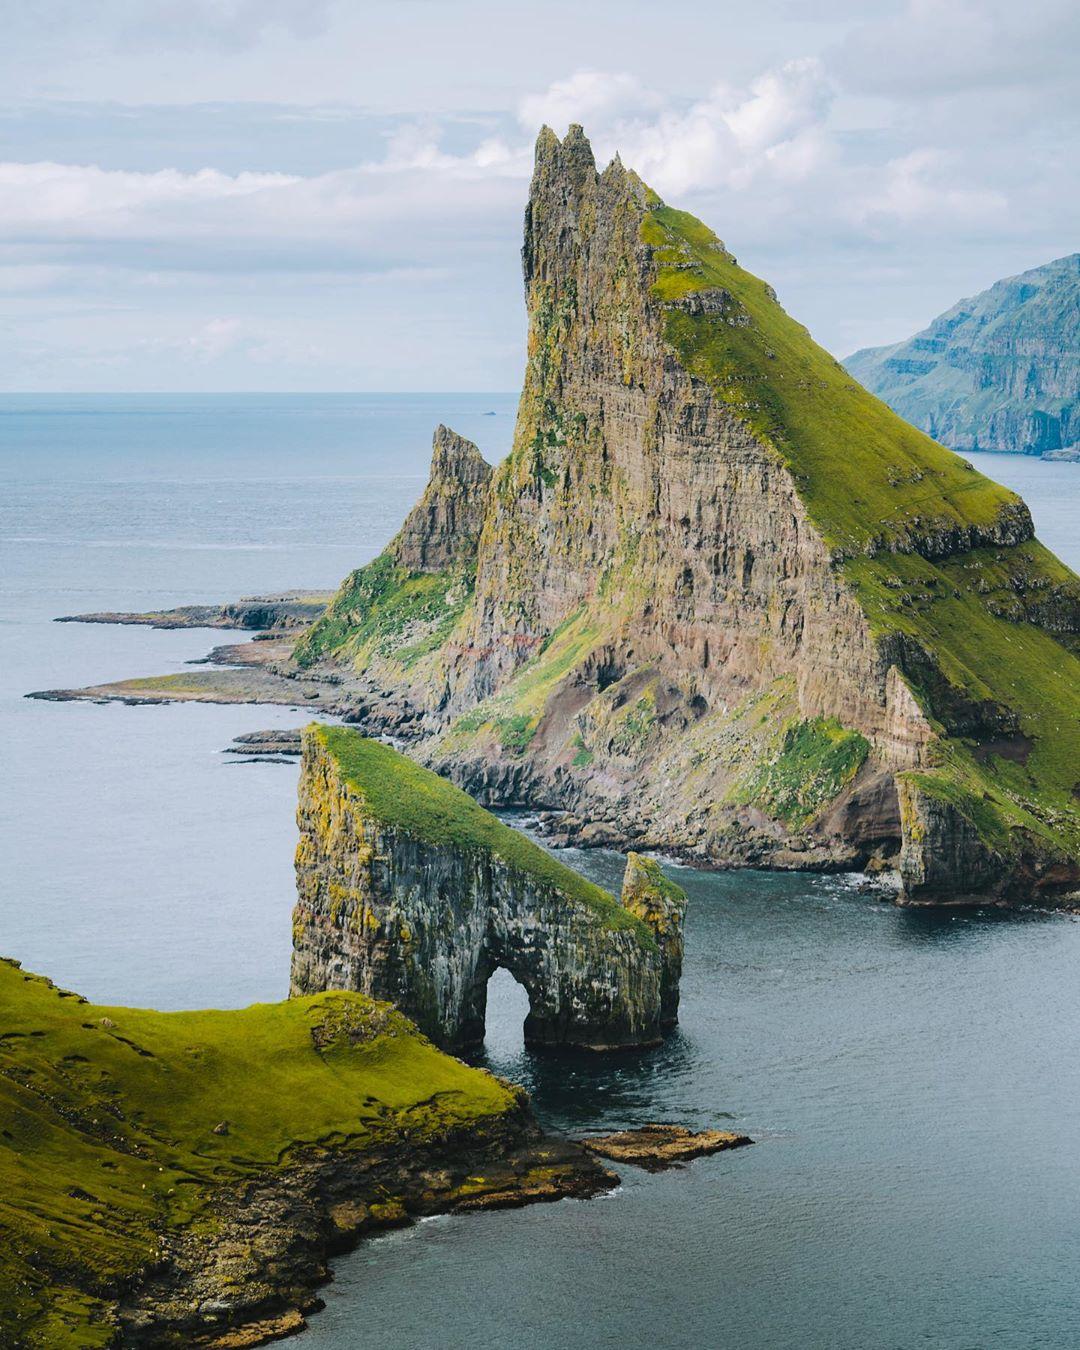 Природа и путешествия на снимках Криса Поплавски